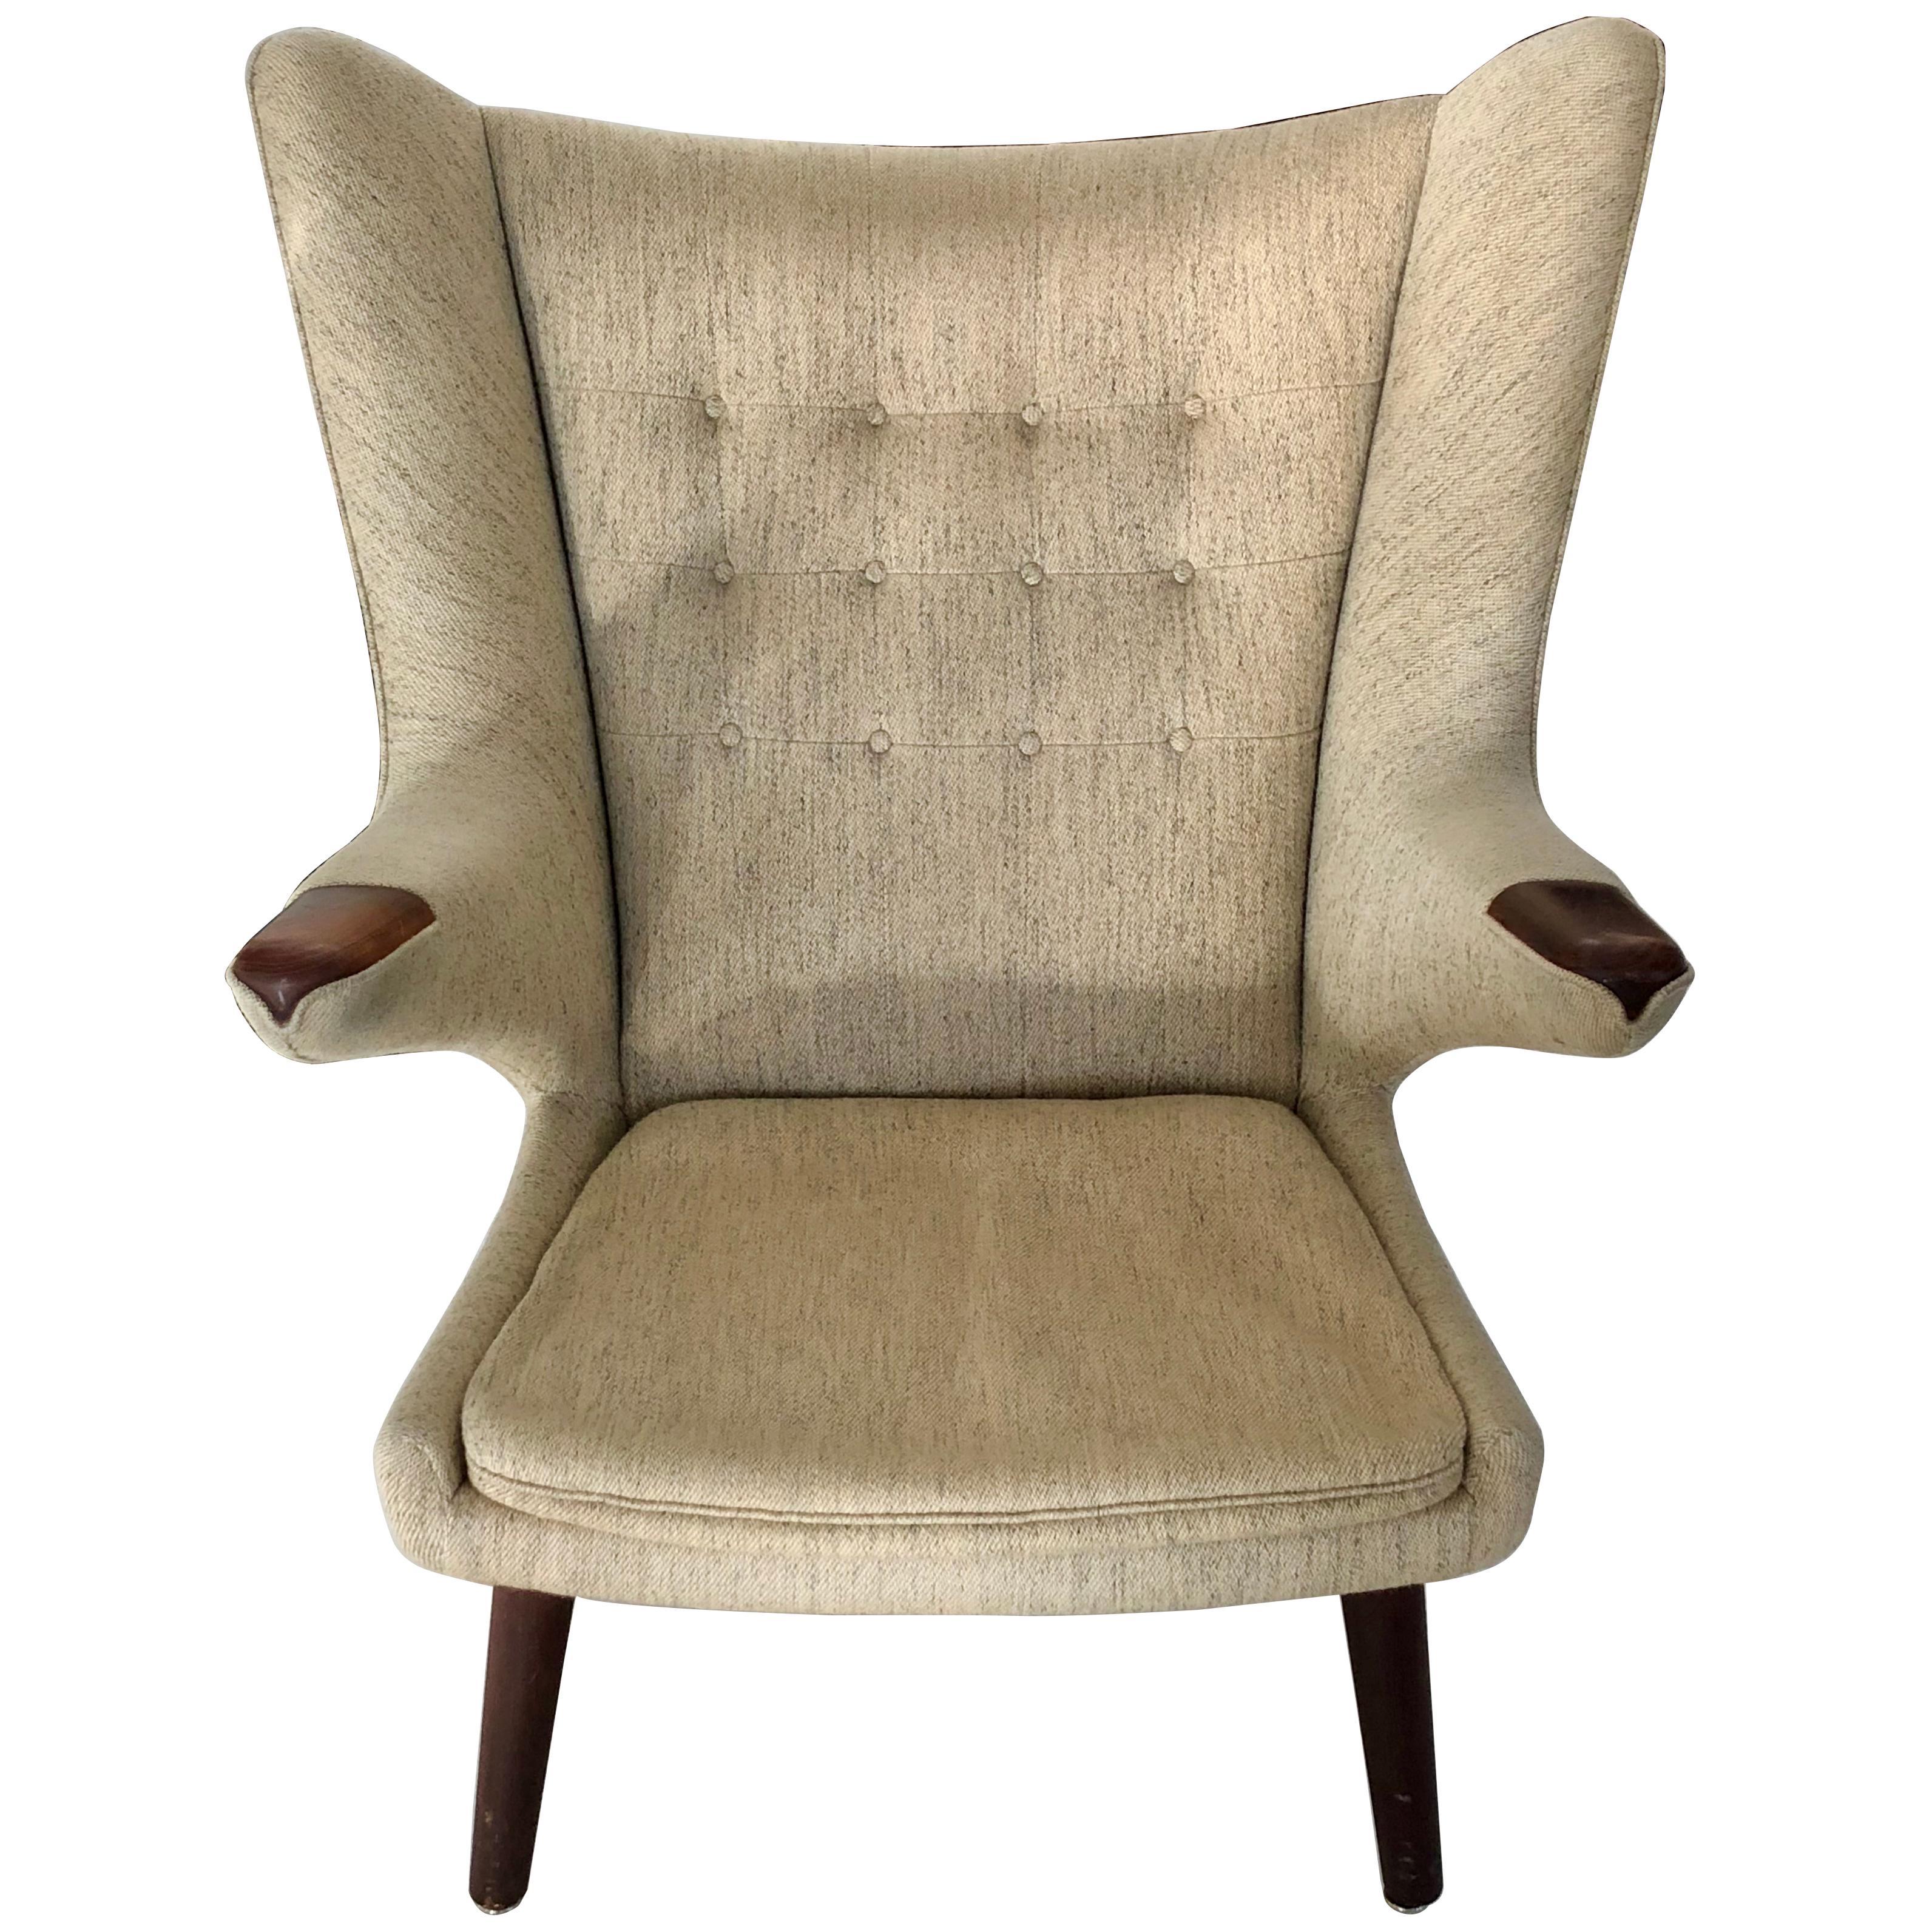 Awesome Hans Wegner Papa Bear Chair Ibusinesslaw Wood Chair Design Ideas Ibusinesslaworg